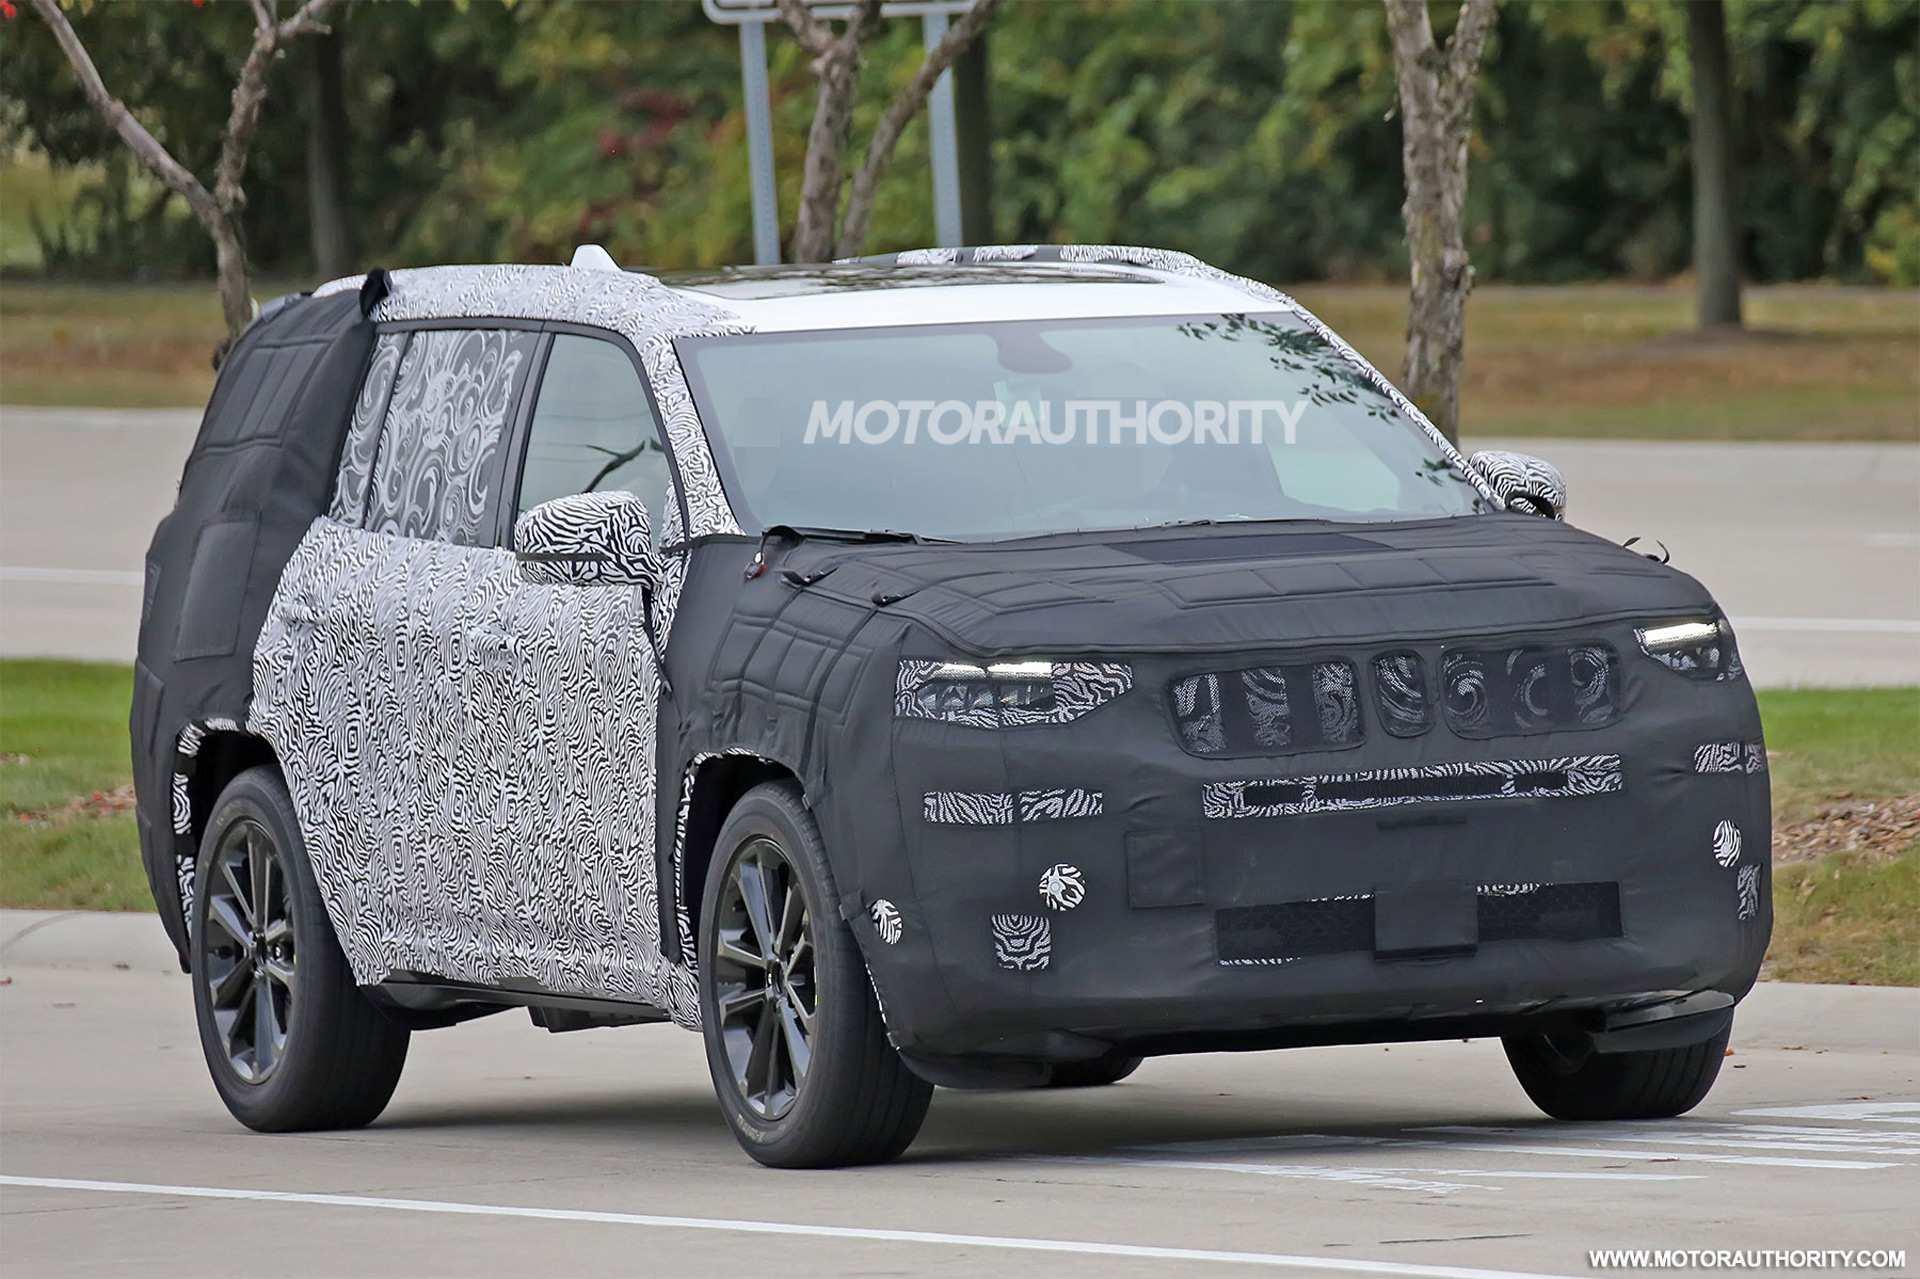 30 Concept of Jeep Grand Cherokee 2020 Spy Shots Engine by Jeep Grand Cherokee 2020 Spy Shots